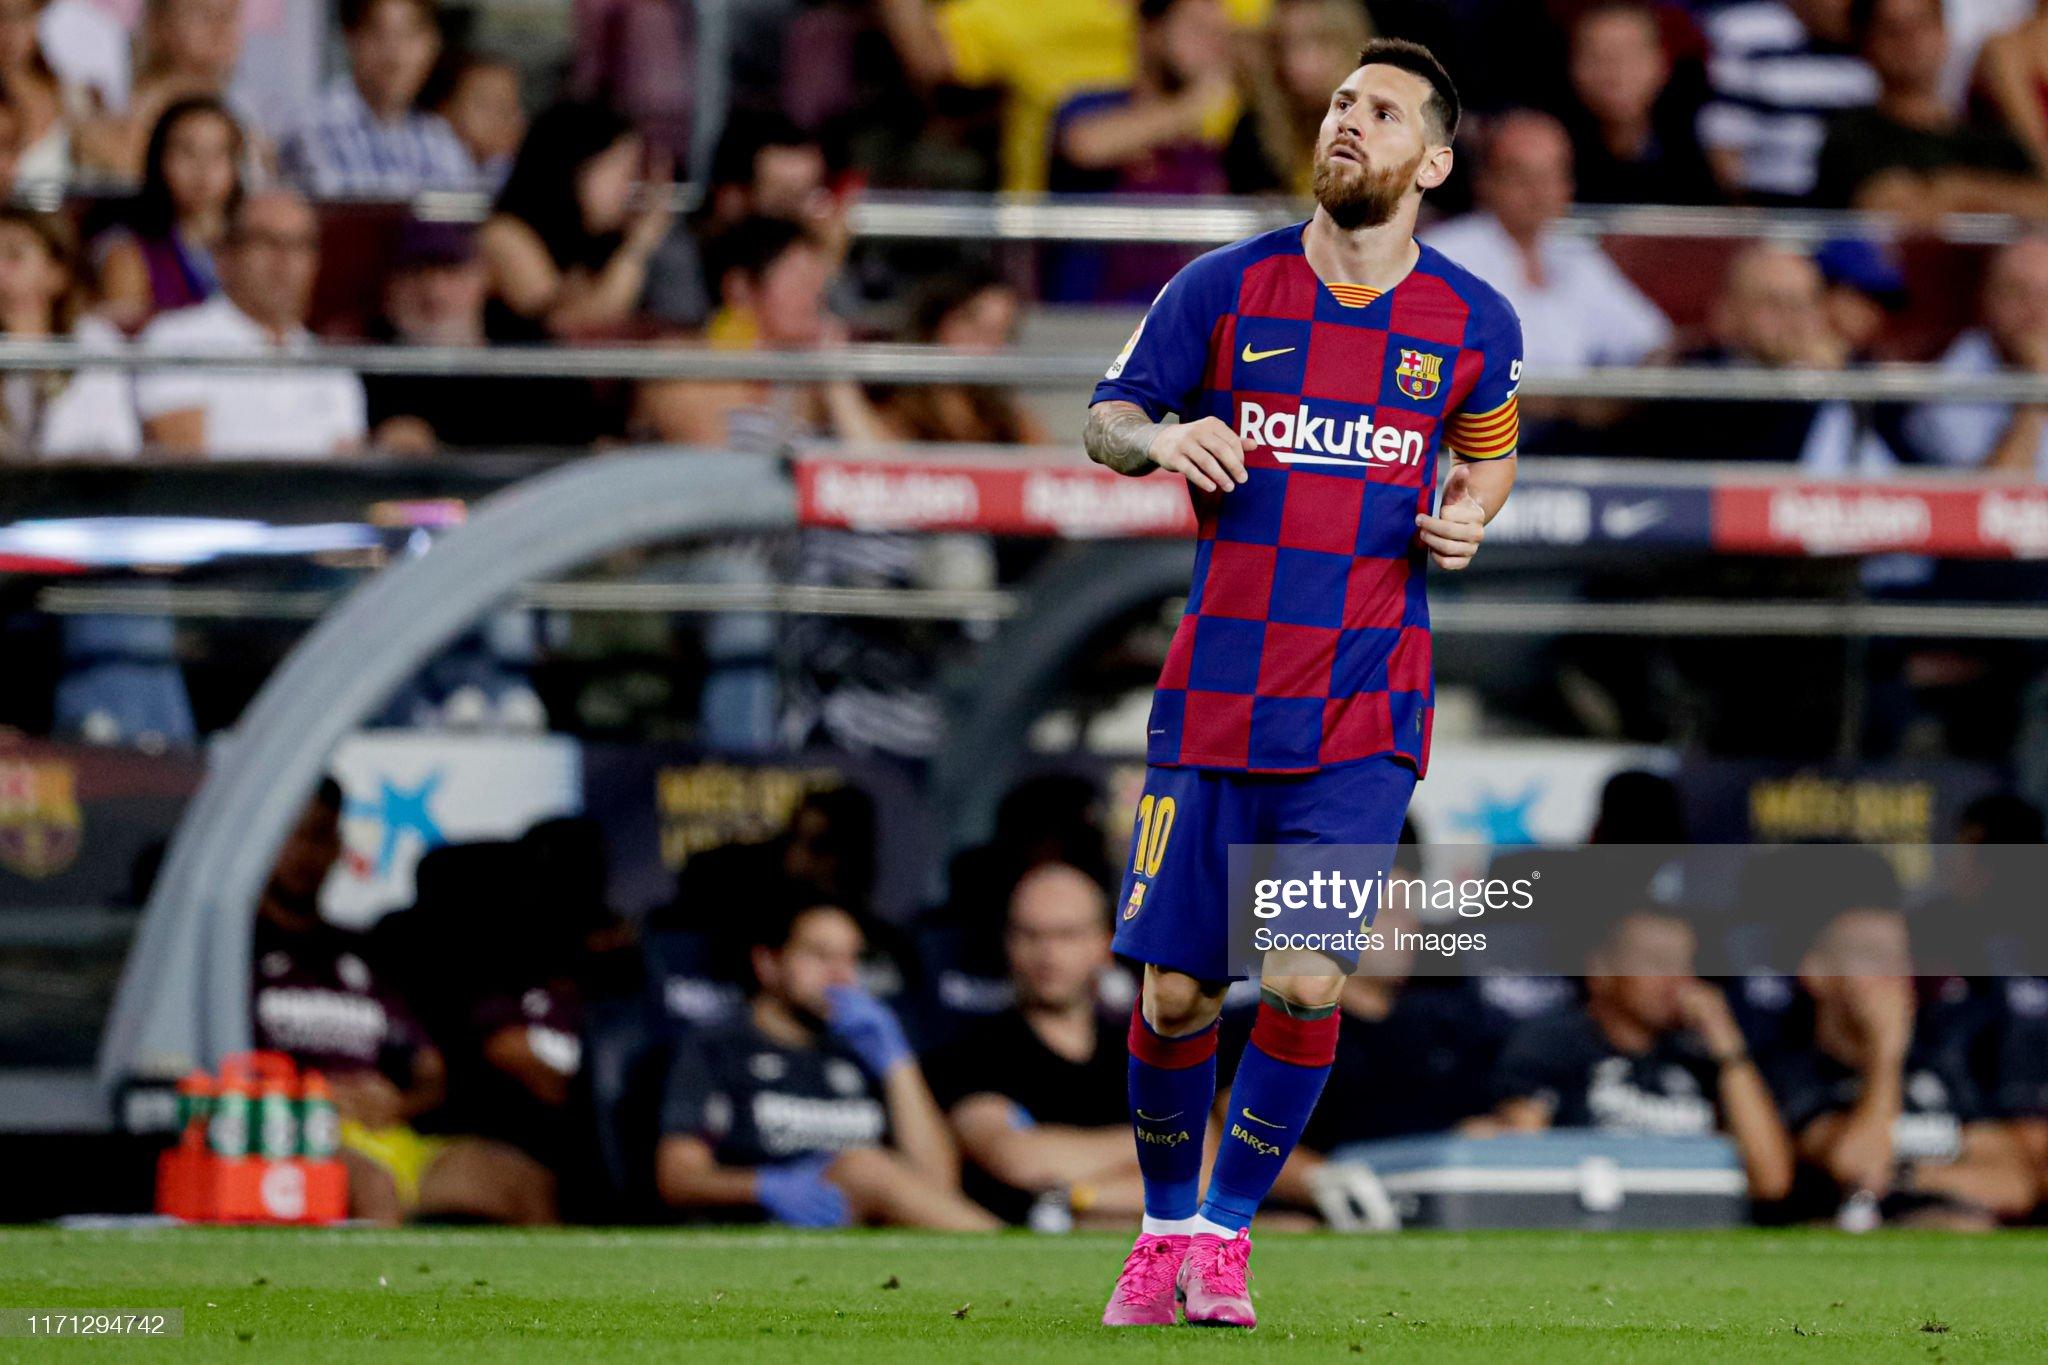 صور مباراة : برشلونة - فياريال 2-1 ( 24-09-2019 )  Lionel-messi-of-fc-barcelona-during-the-la-liga-santander-match-fc-picture-id1171294742?s=2048x2048